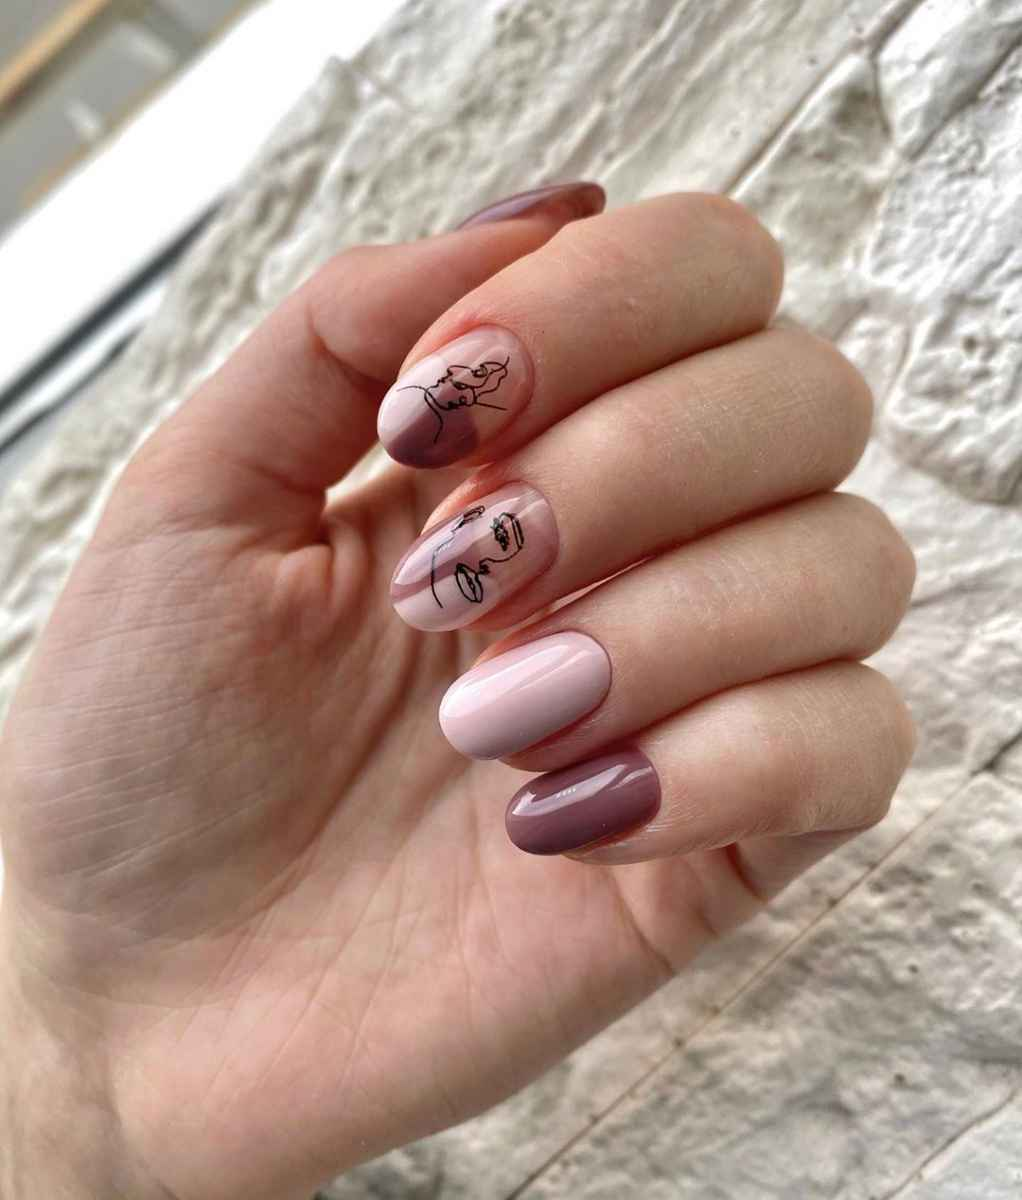 Маникюр с лицами на ногтях фото_28